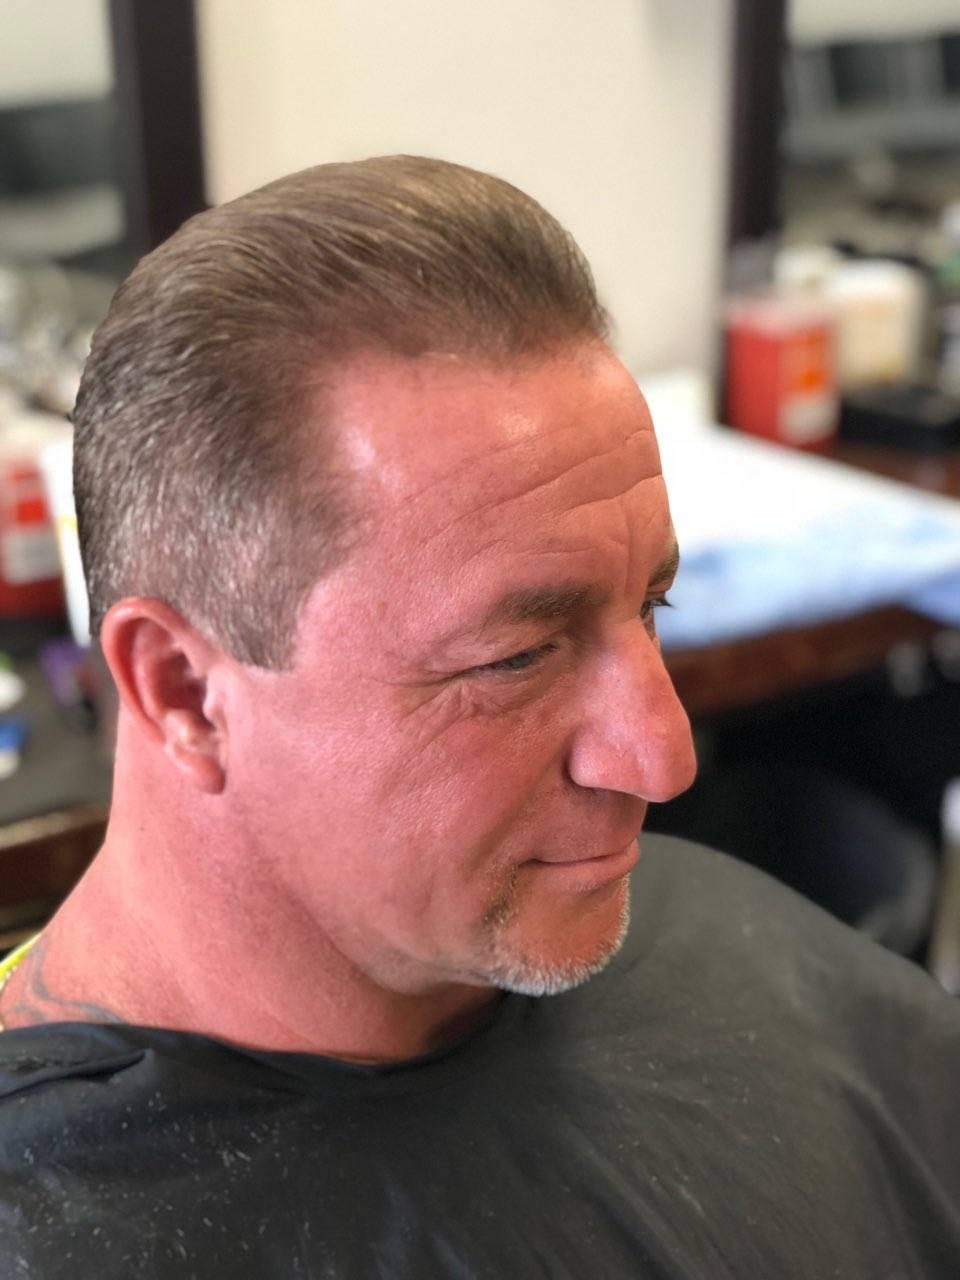 Scissors Edge Barber shop - hair care  | Photo 8 of 8 | Address: 1318 Seven Springs Blvd, New Port Richey, FL 34655, USA | Phone: (727) 375-0796